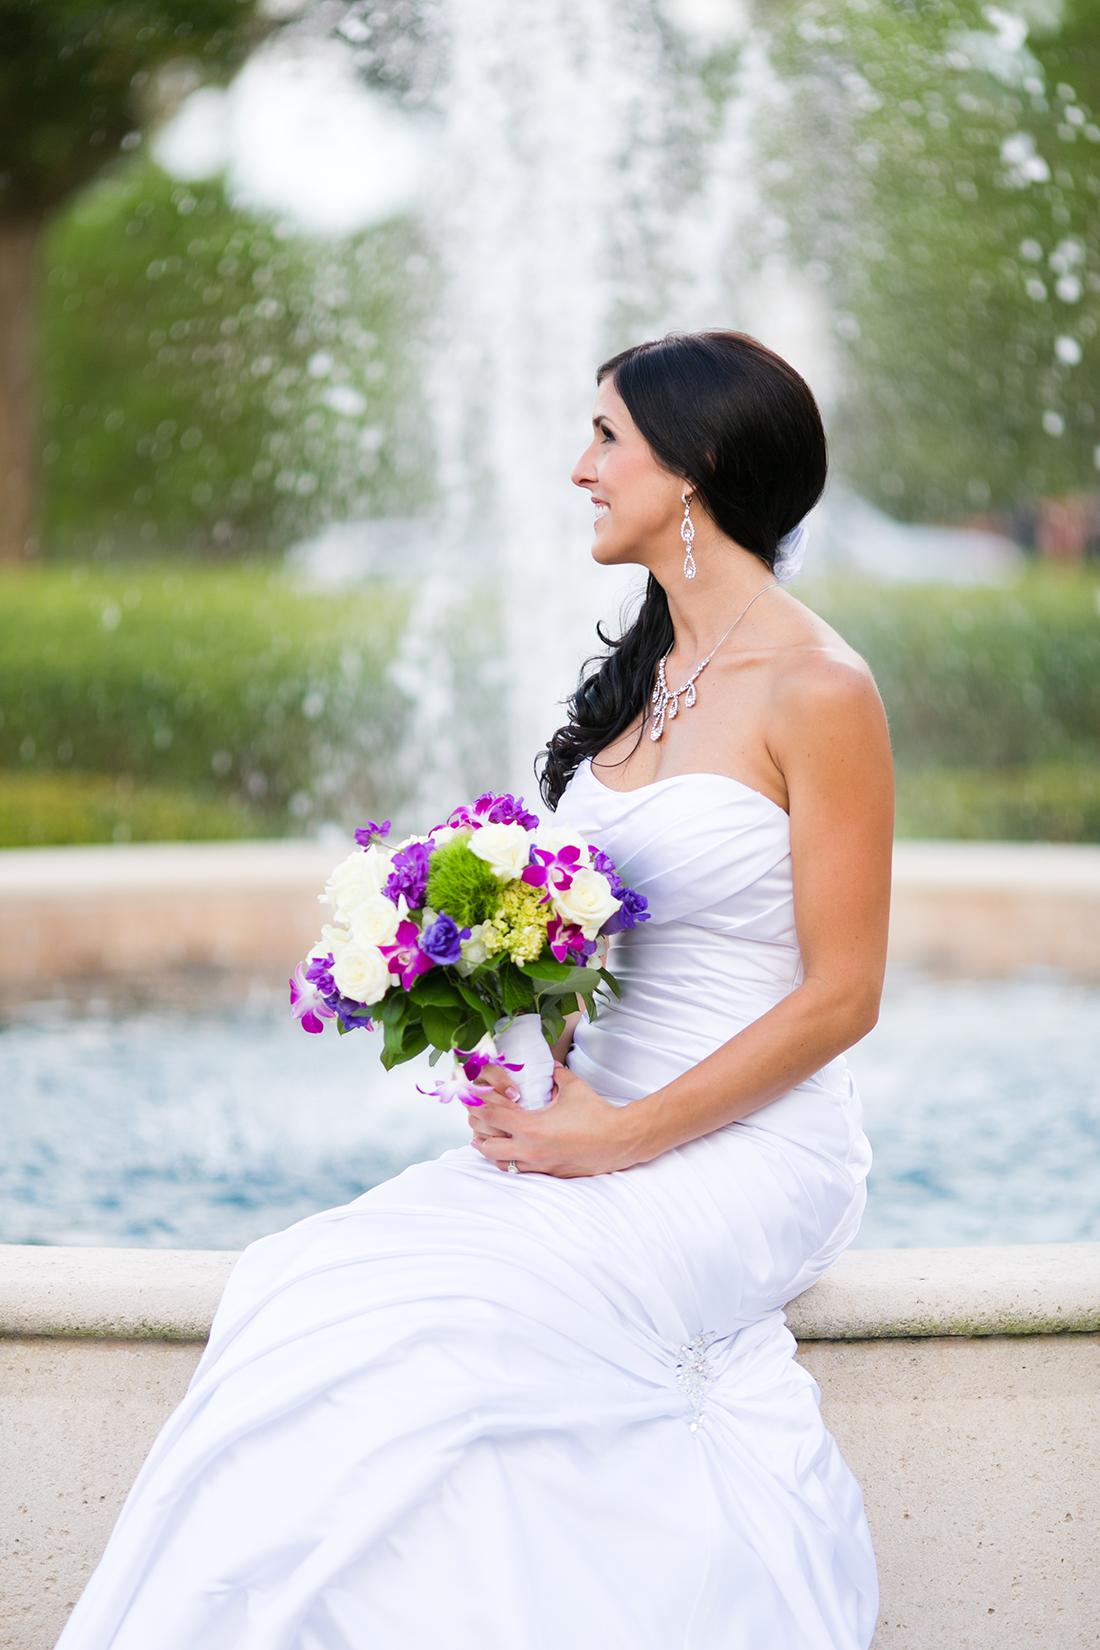 adam-szarmack-tpc-sawgrass-ponte-vedra-wedding-photographer-PZ3A9707.jpg